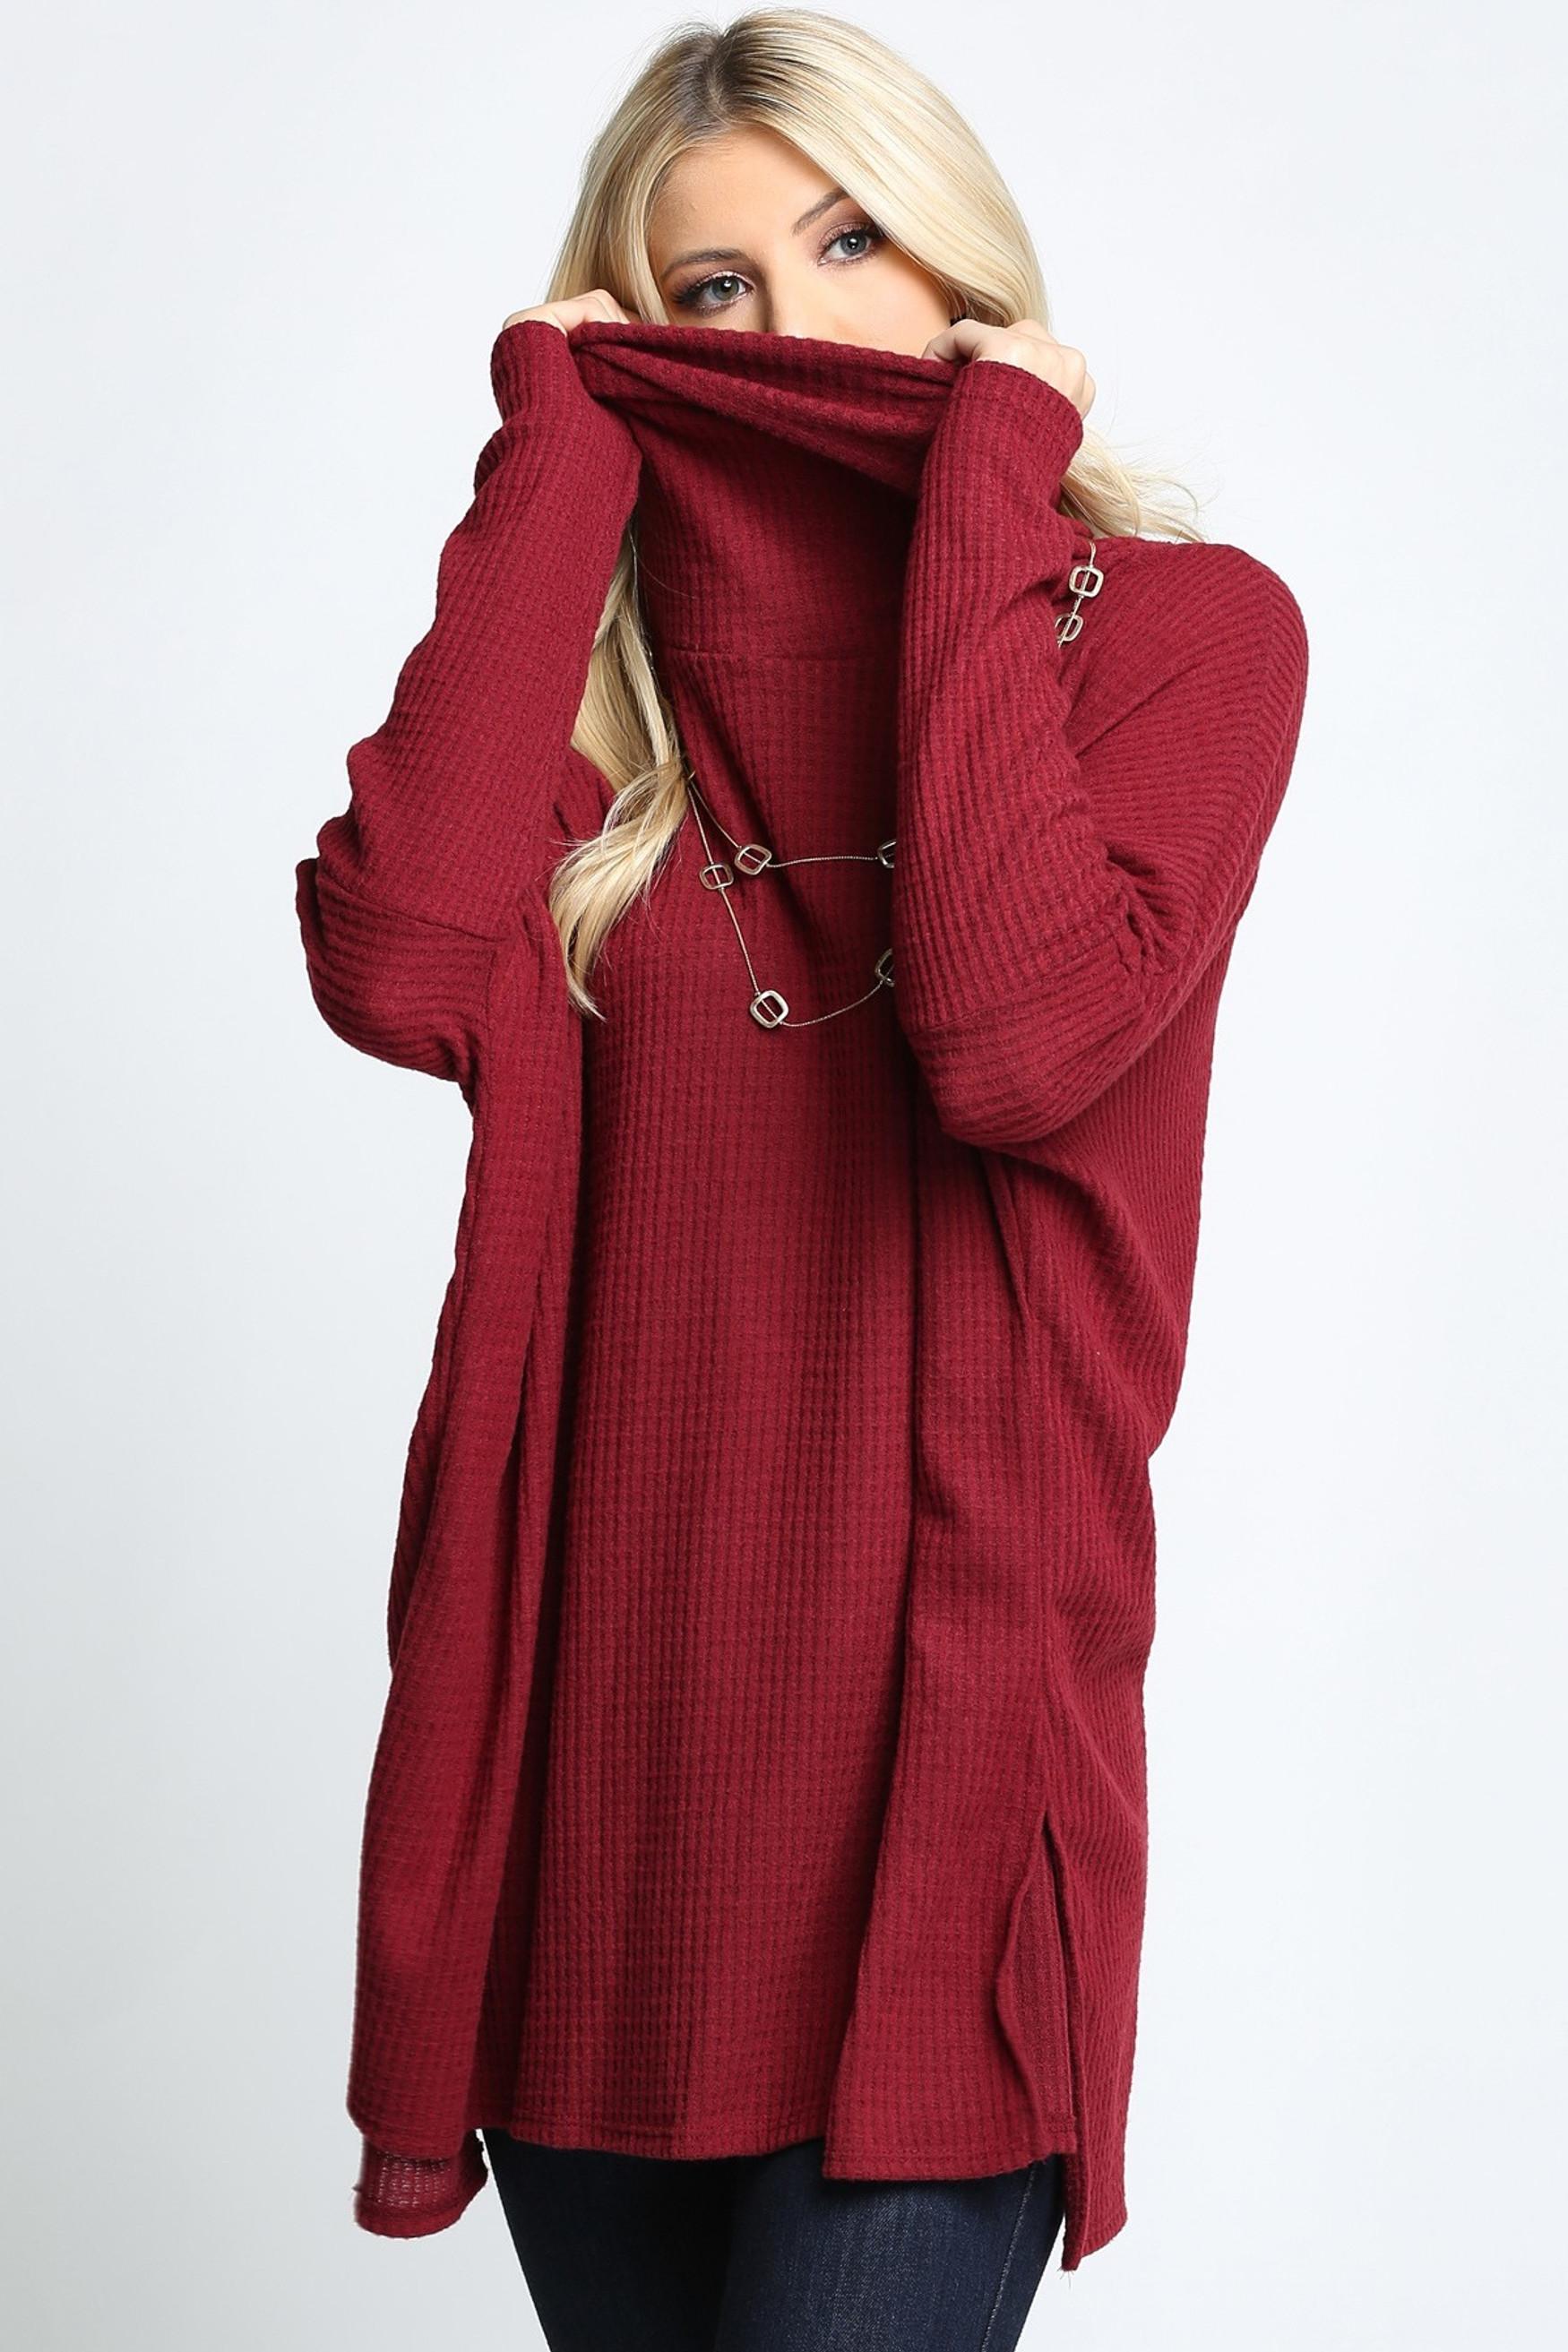 Burgundy Waffle Knit Cowl Neck Dolman Sleeve Top